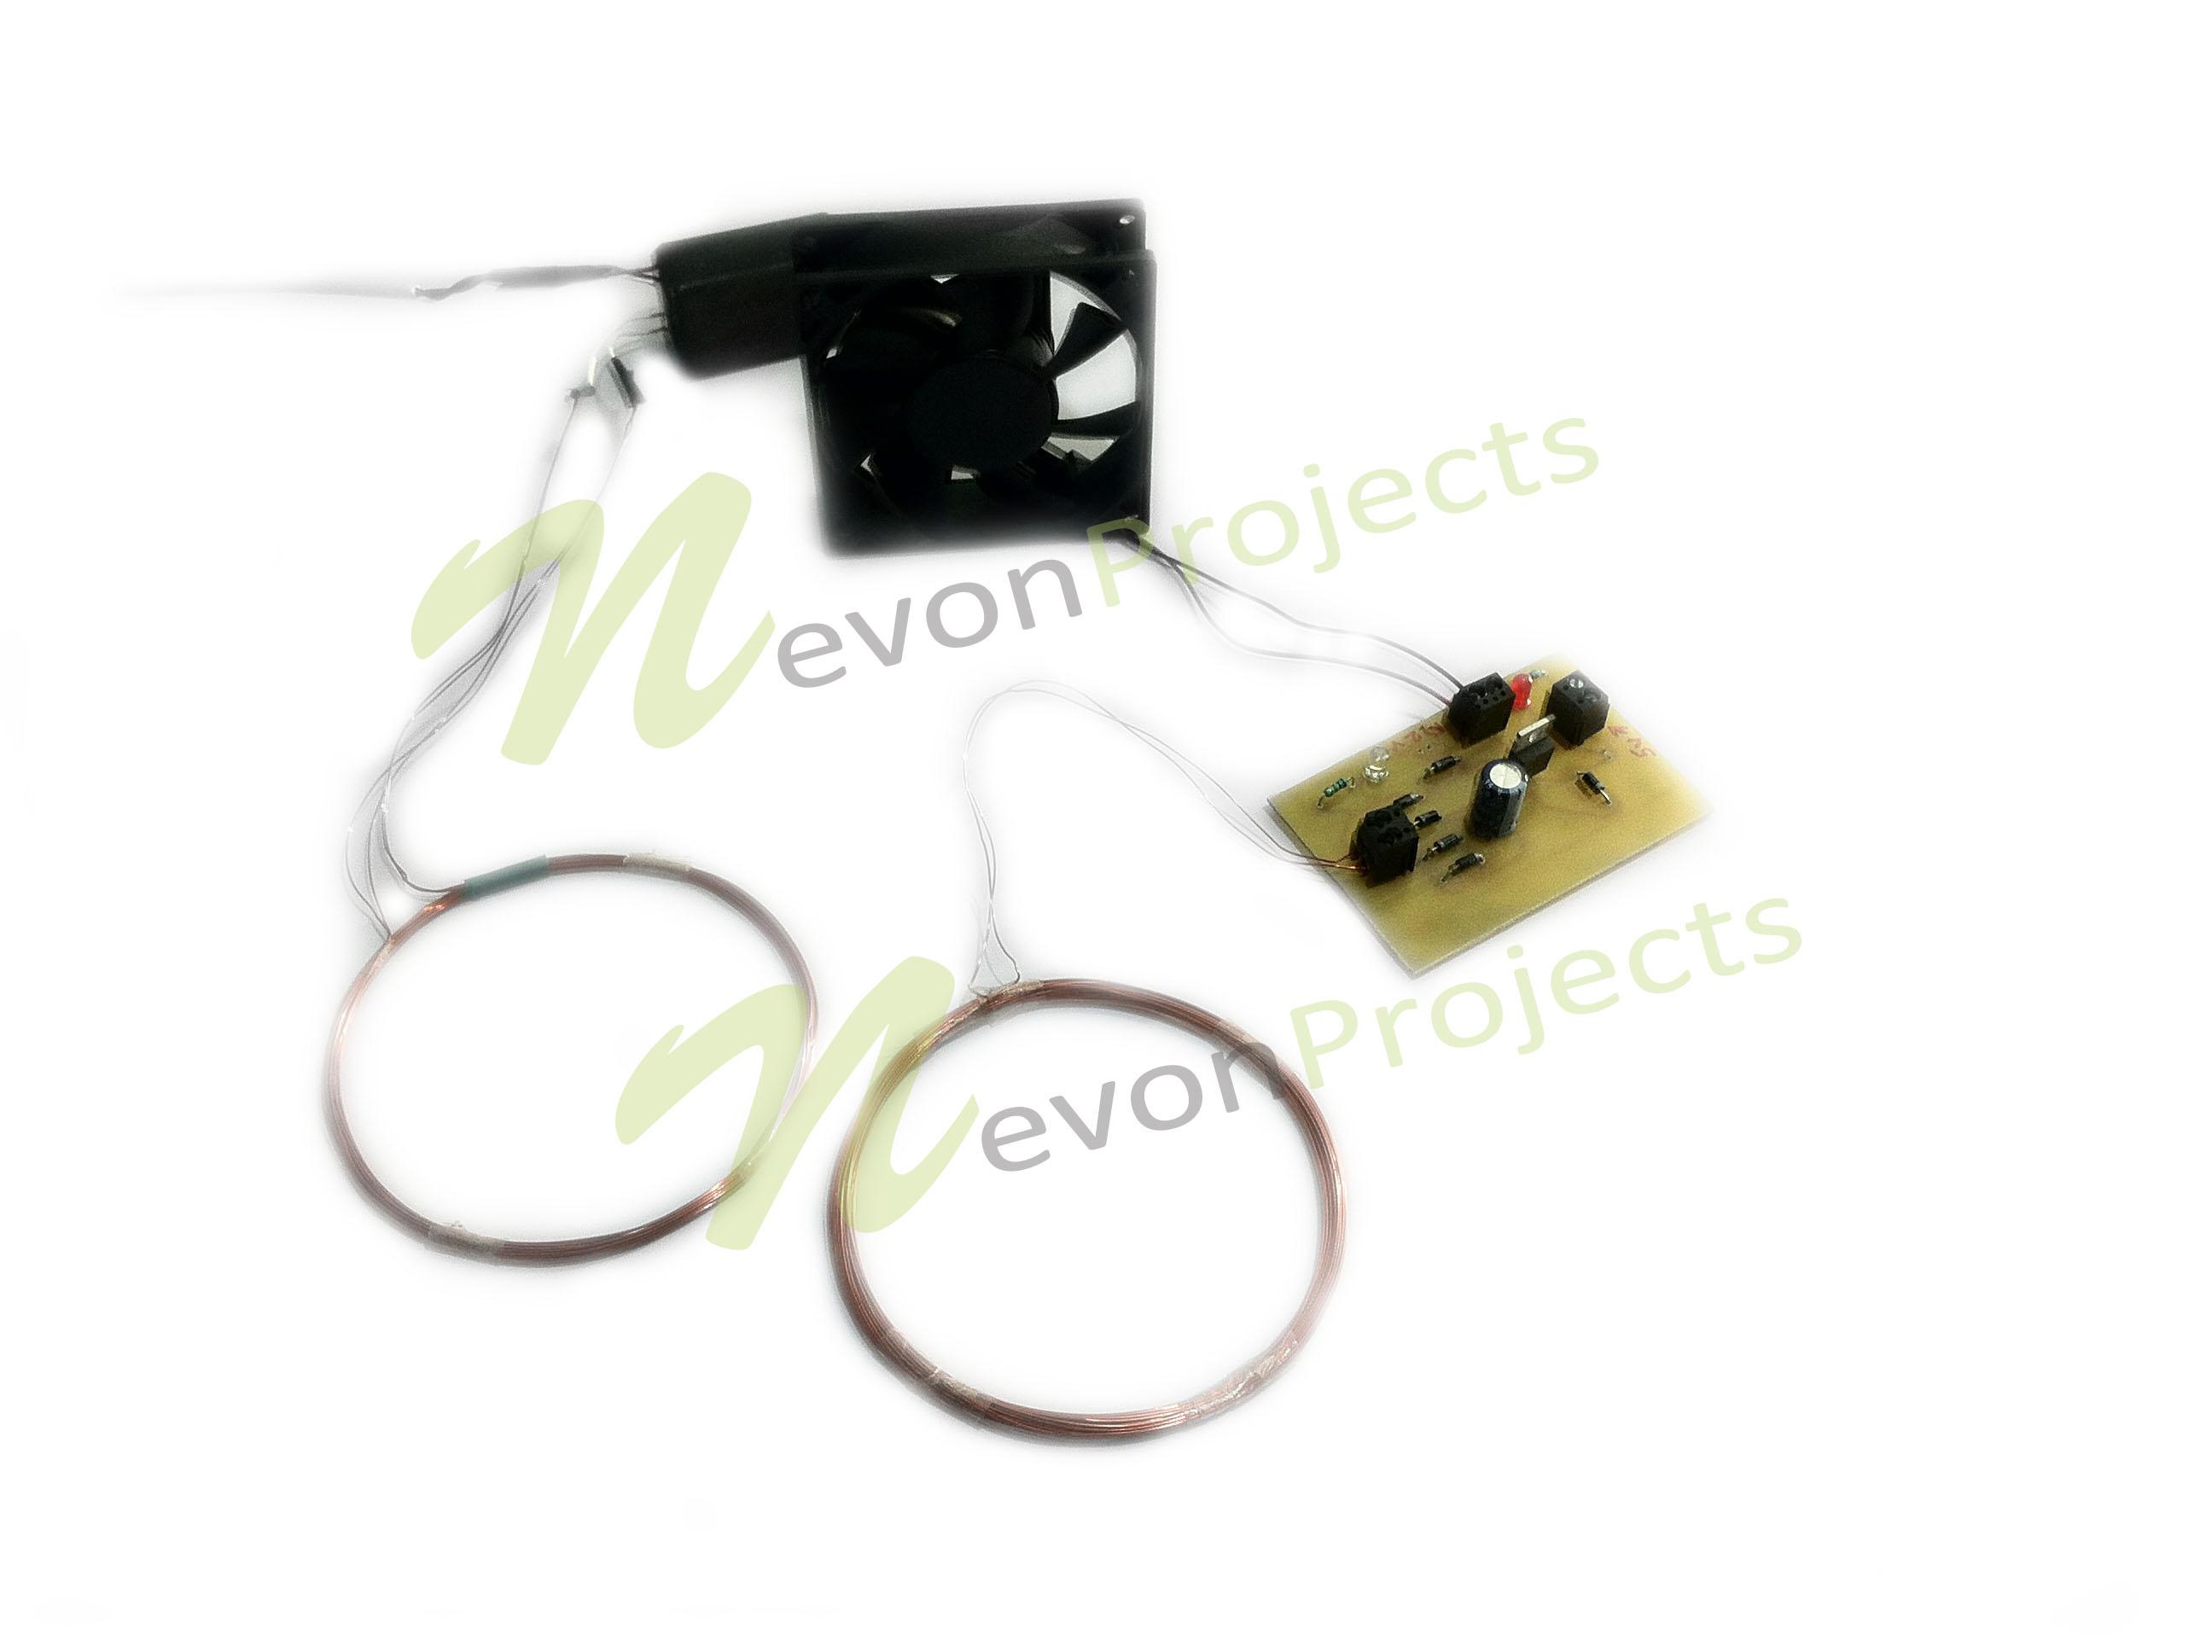 Advanced Wireless Power Transferring Project | NevonProjects